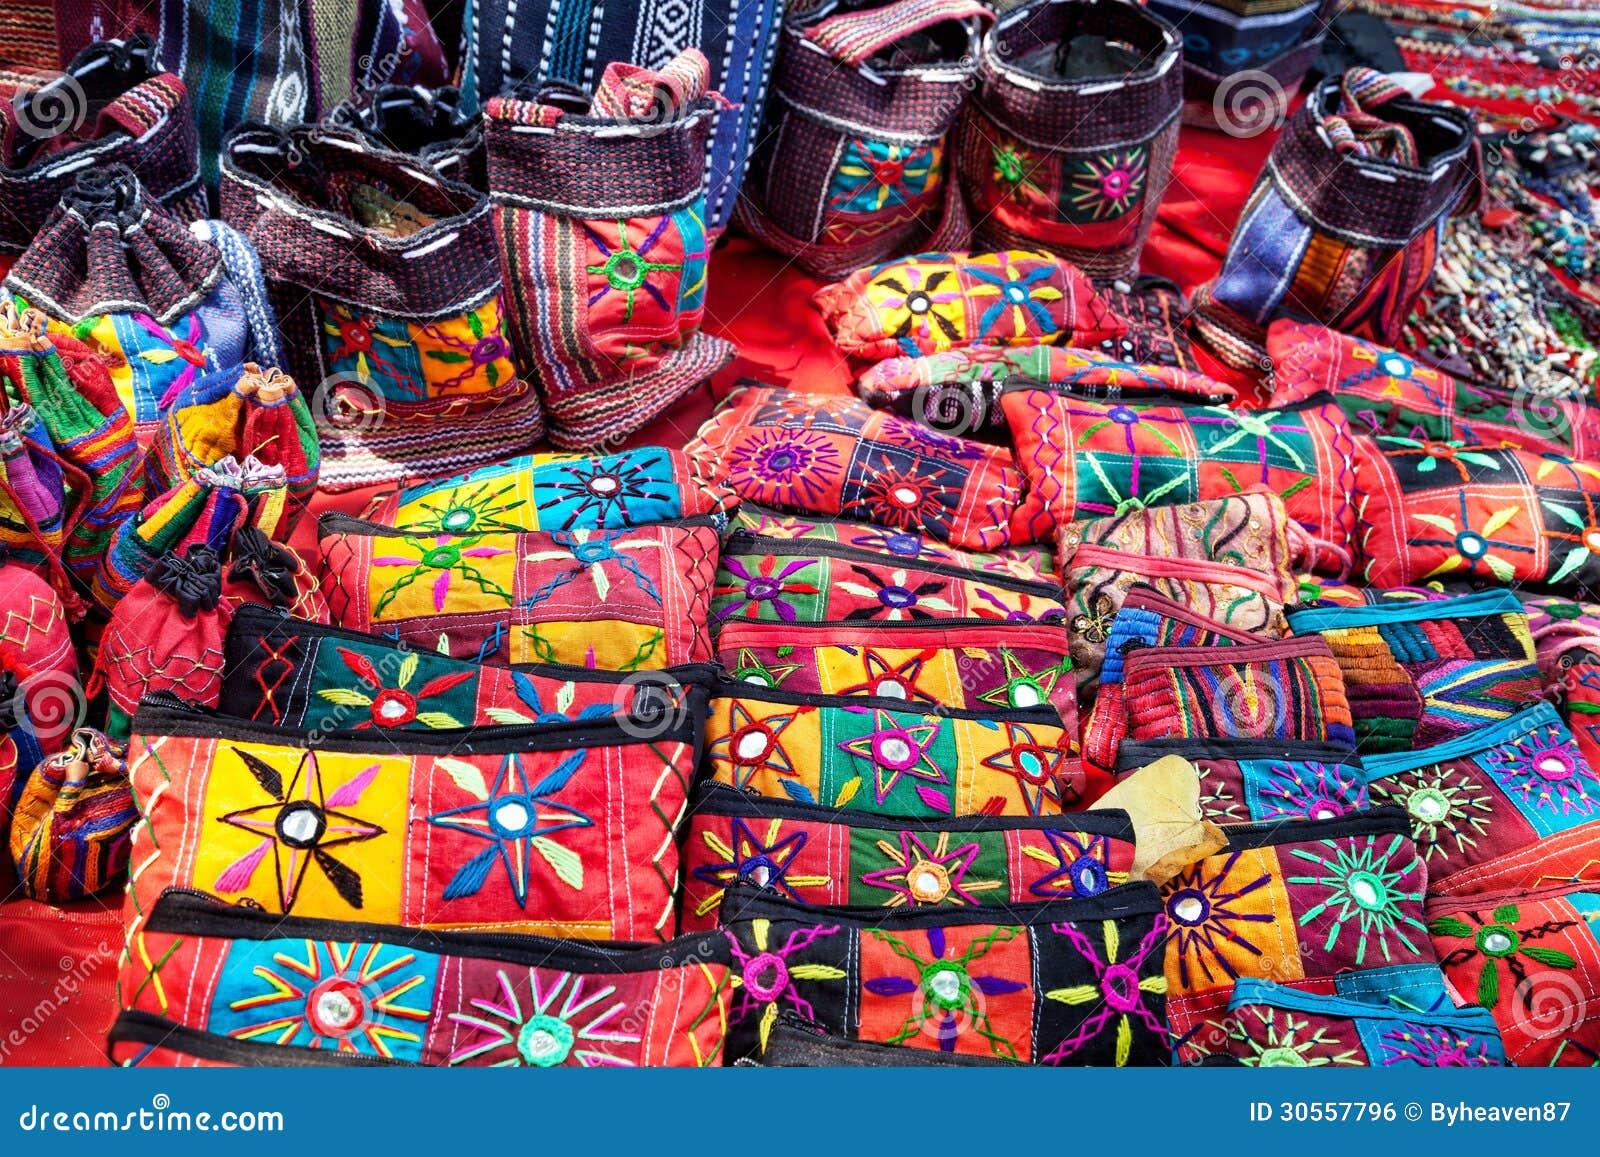 Ethnic market